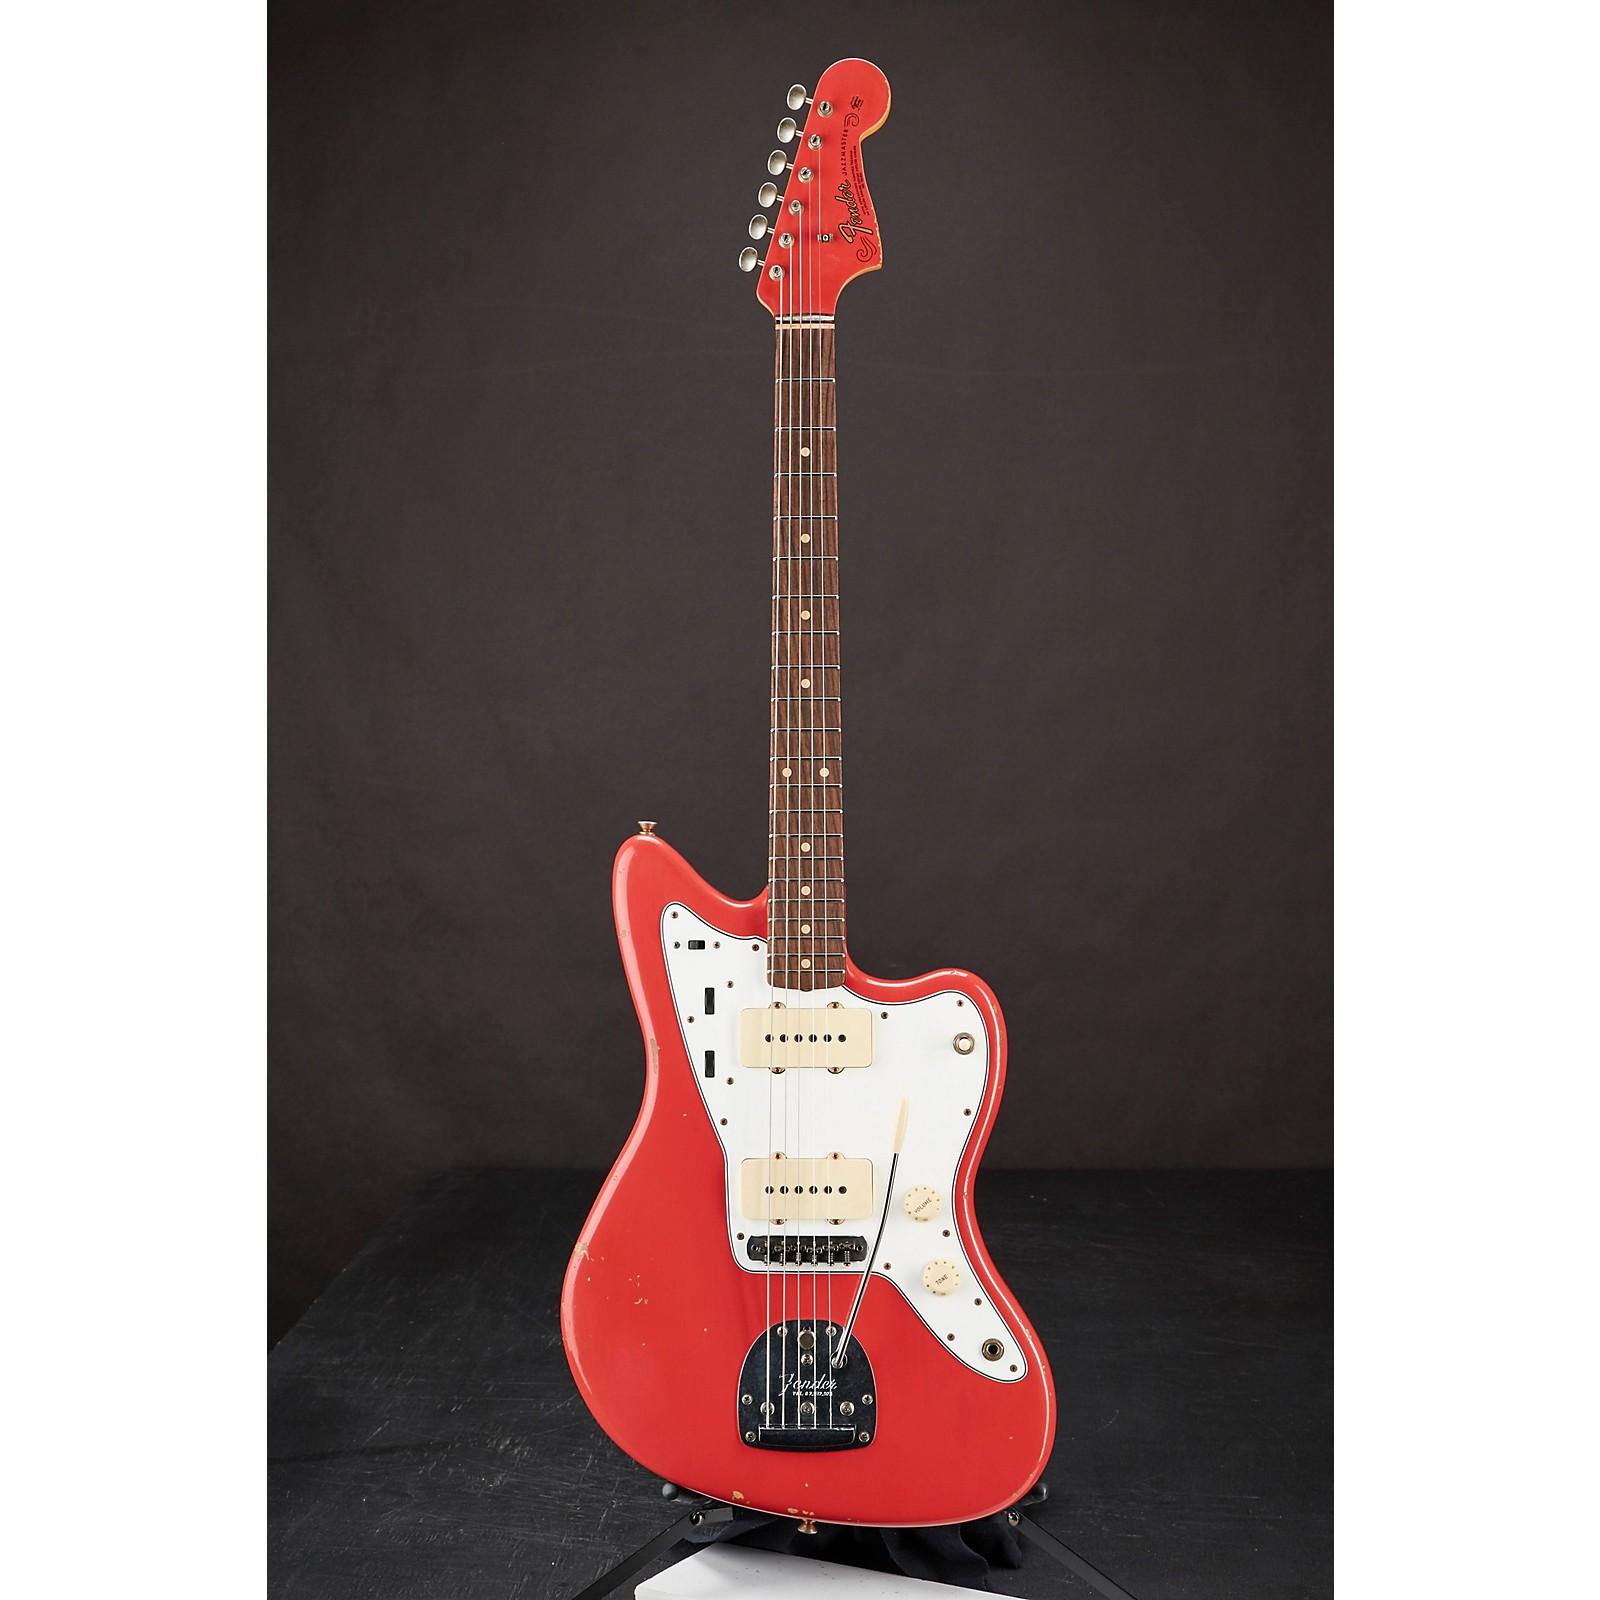 Fender Custom Shop 1966 Jazzmaster Relic Matching Headcap Electric Guitar